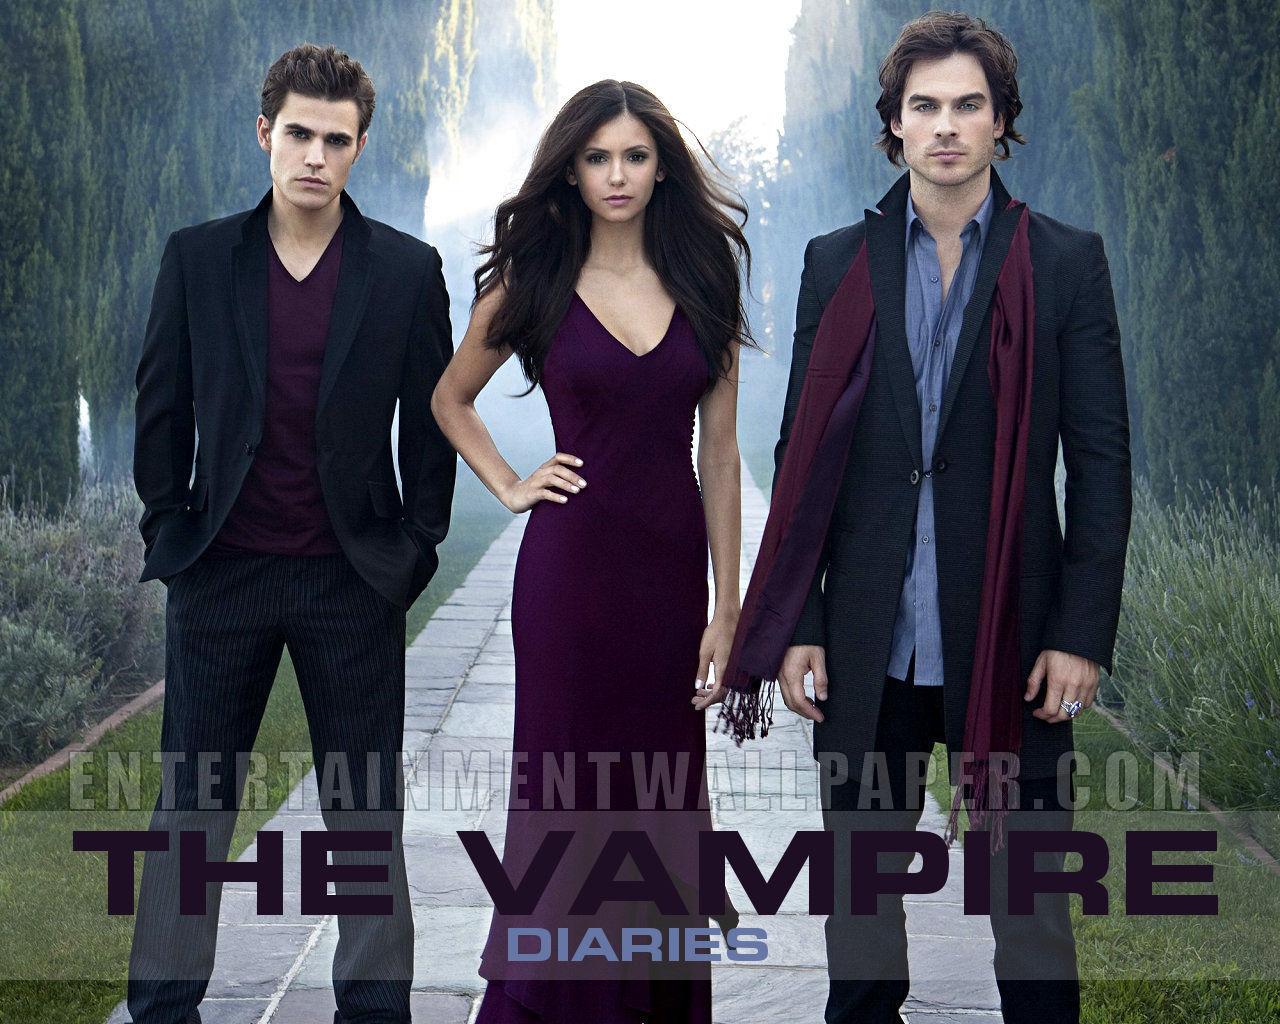 the vampire diaries TVD-the-vampire-diaries-tv-show-12835150-1280-1024